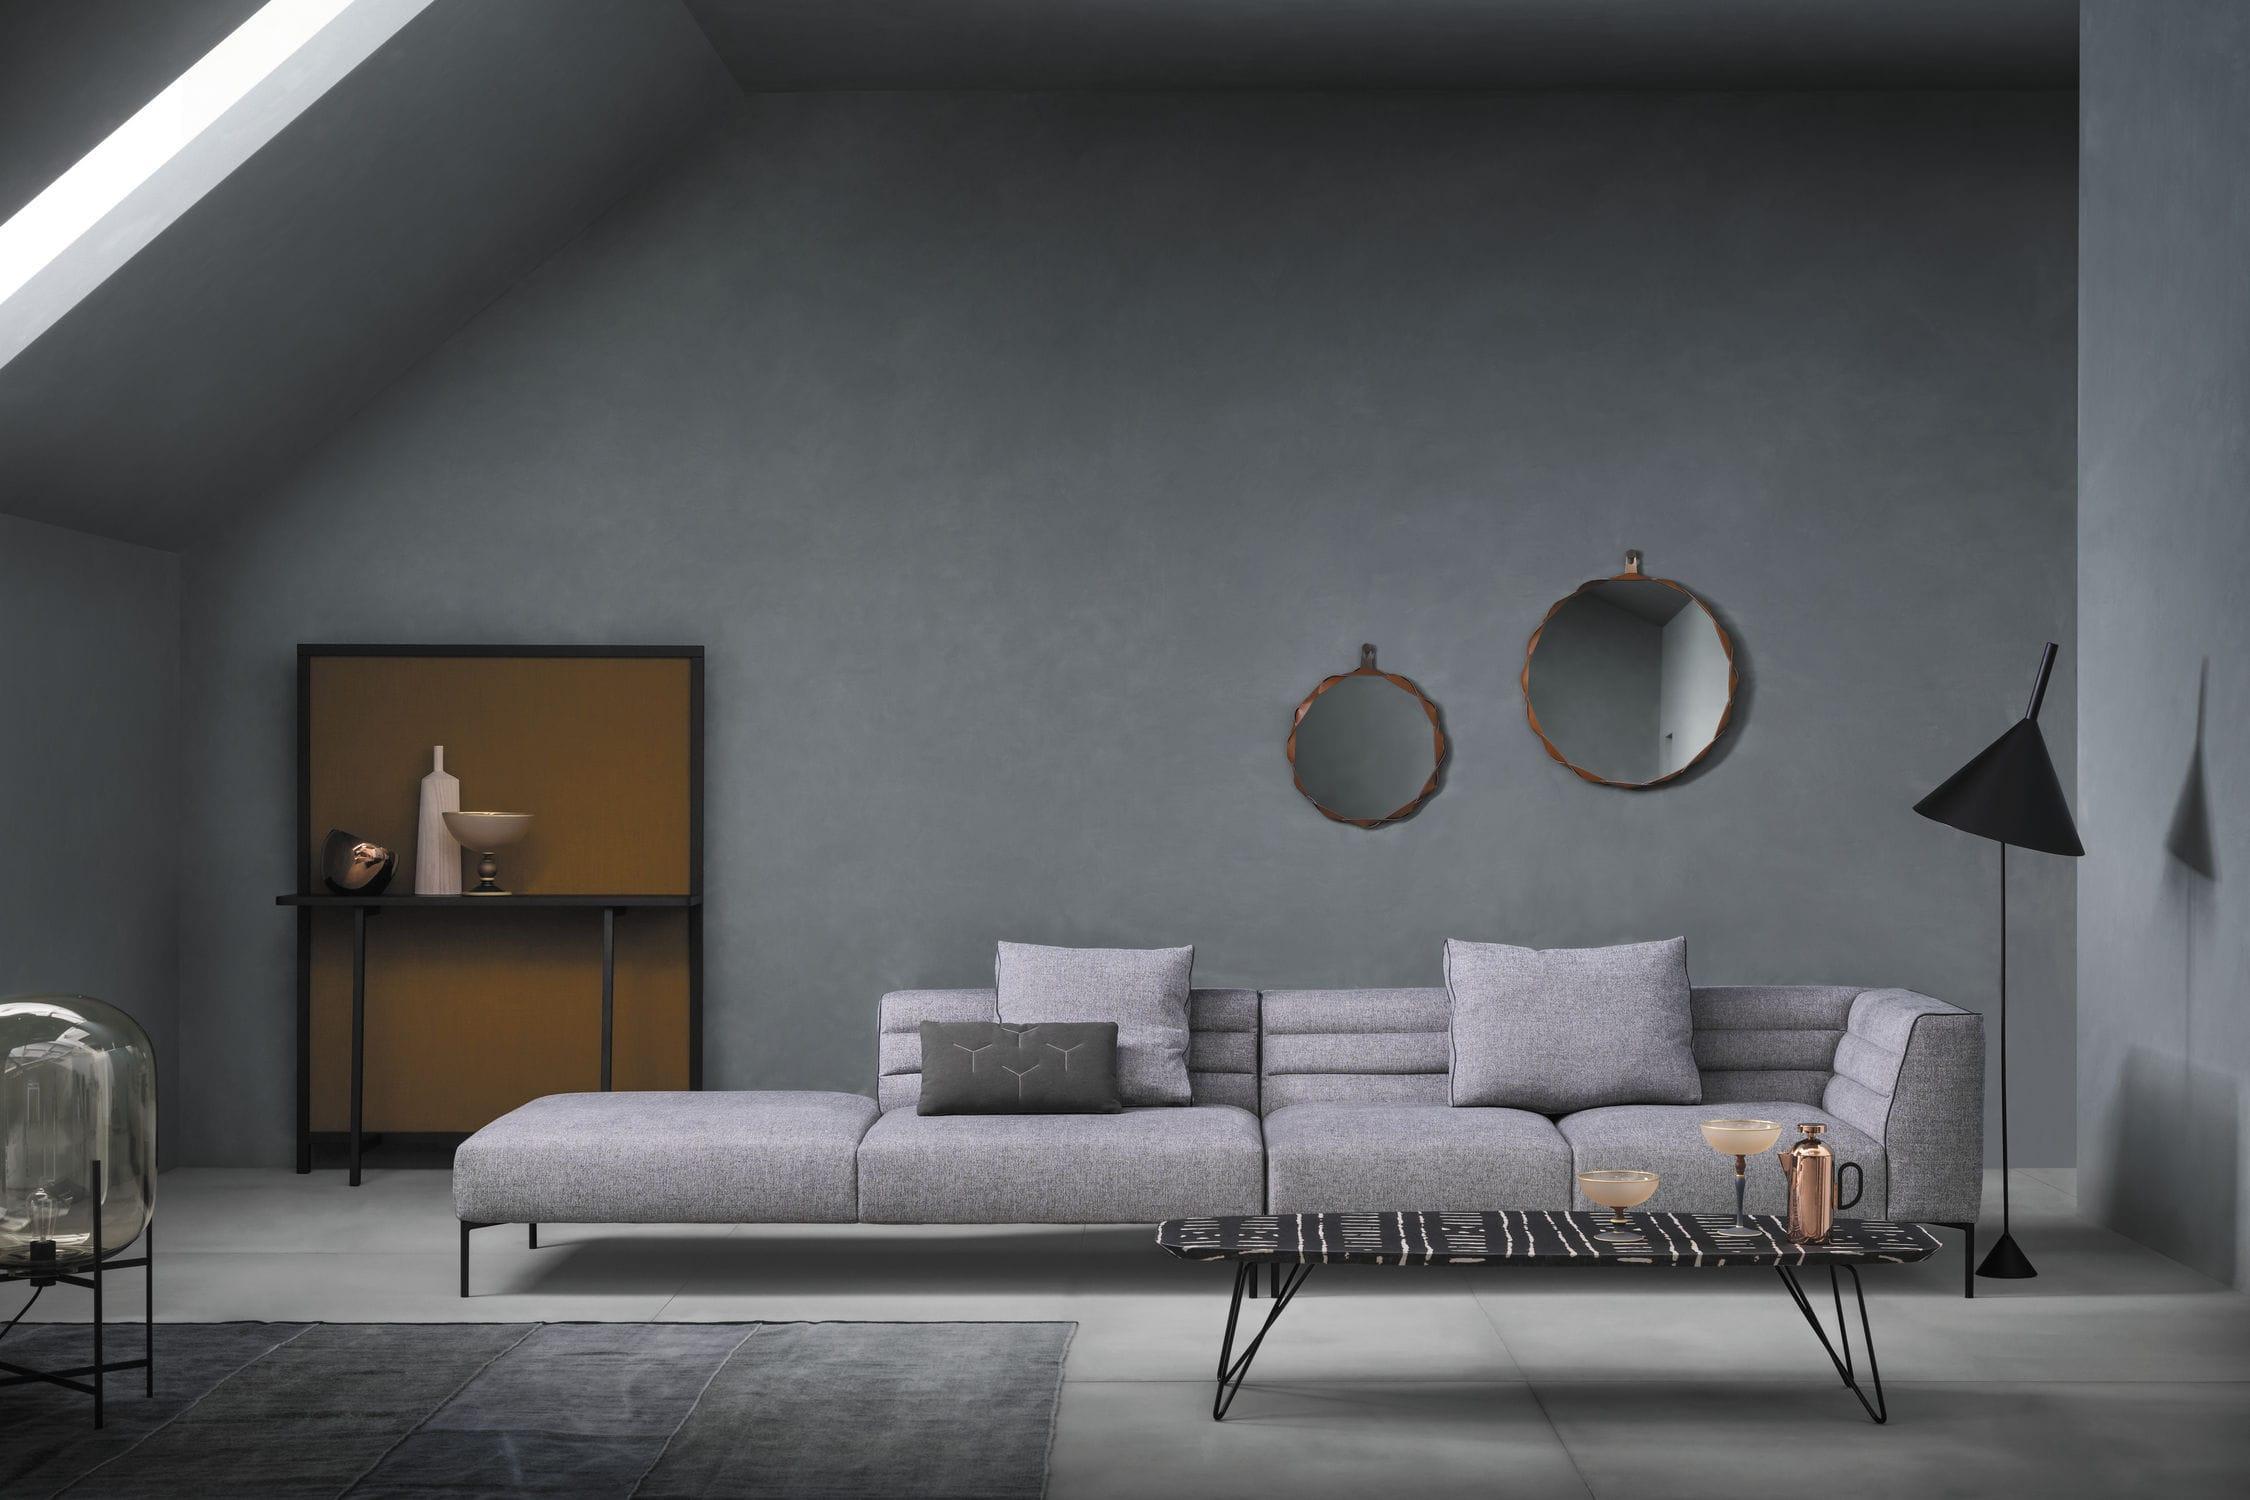 outdoor sofa furniture jonathan louis reviews zanotta - dedirekteurswoning